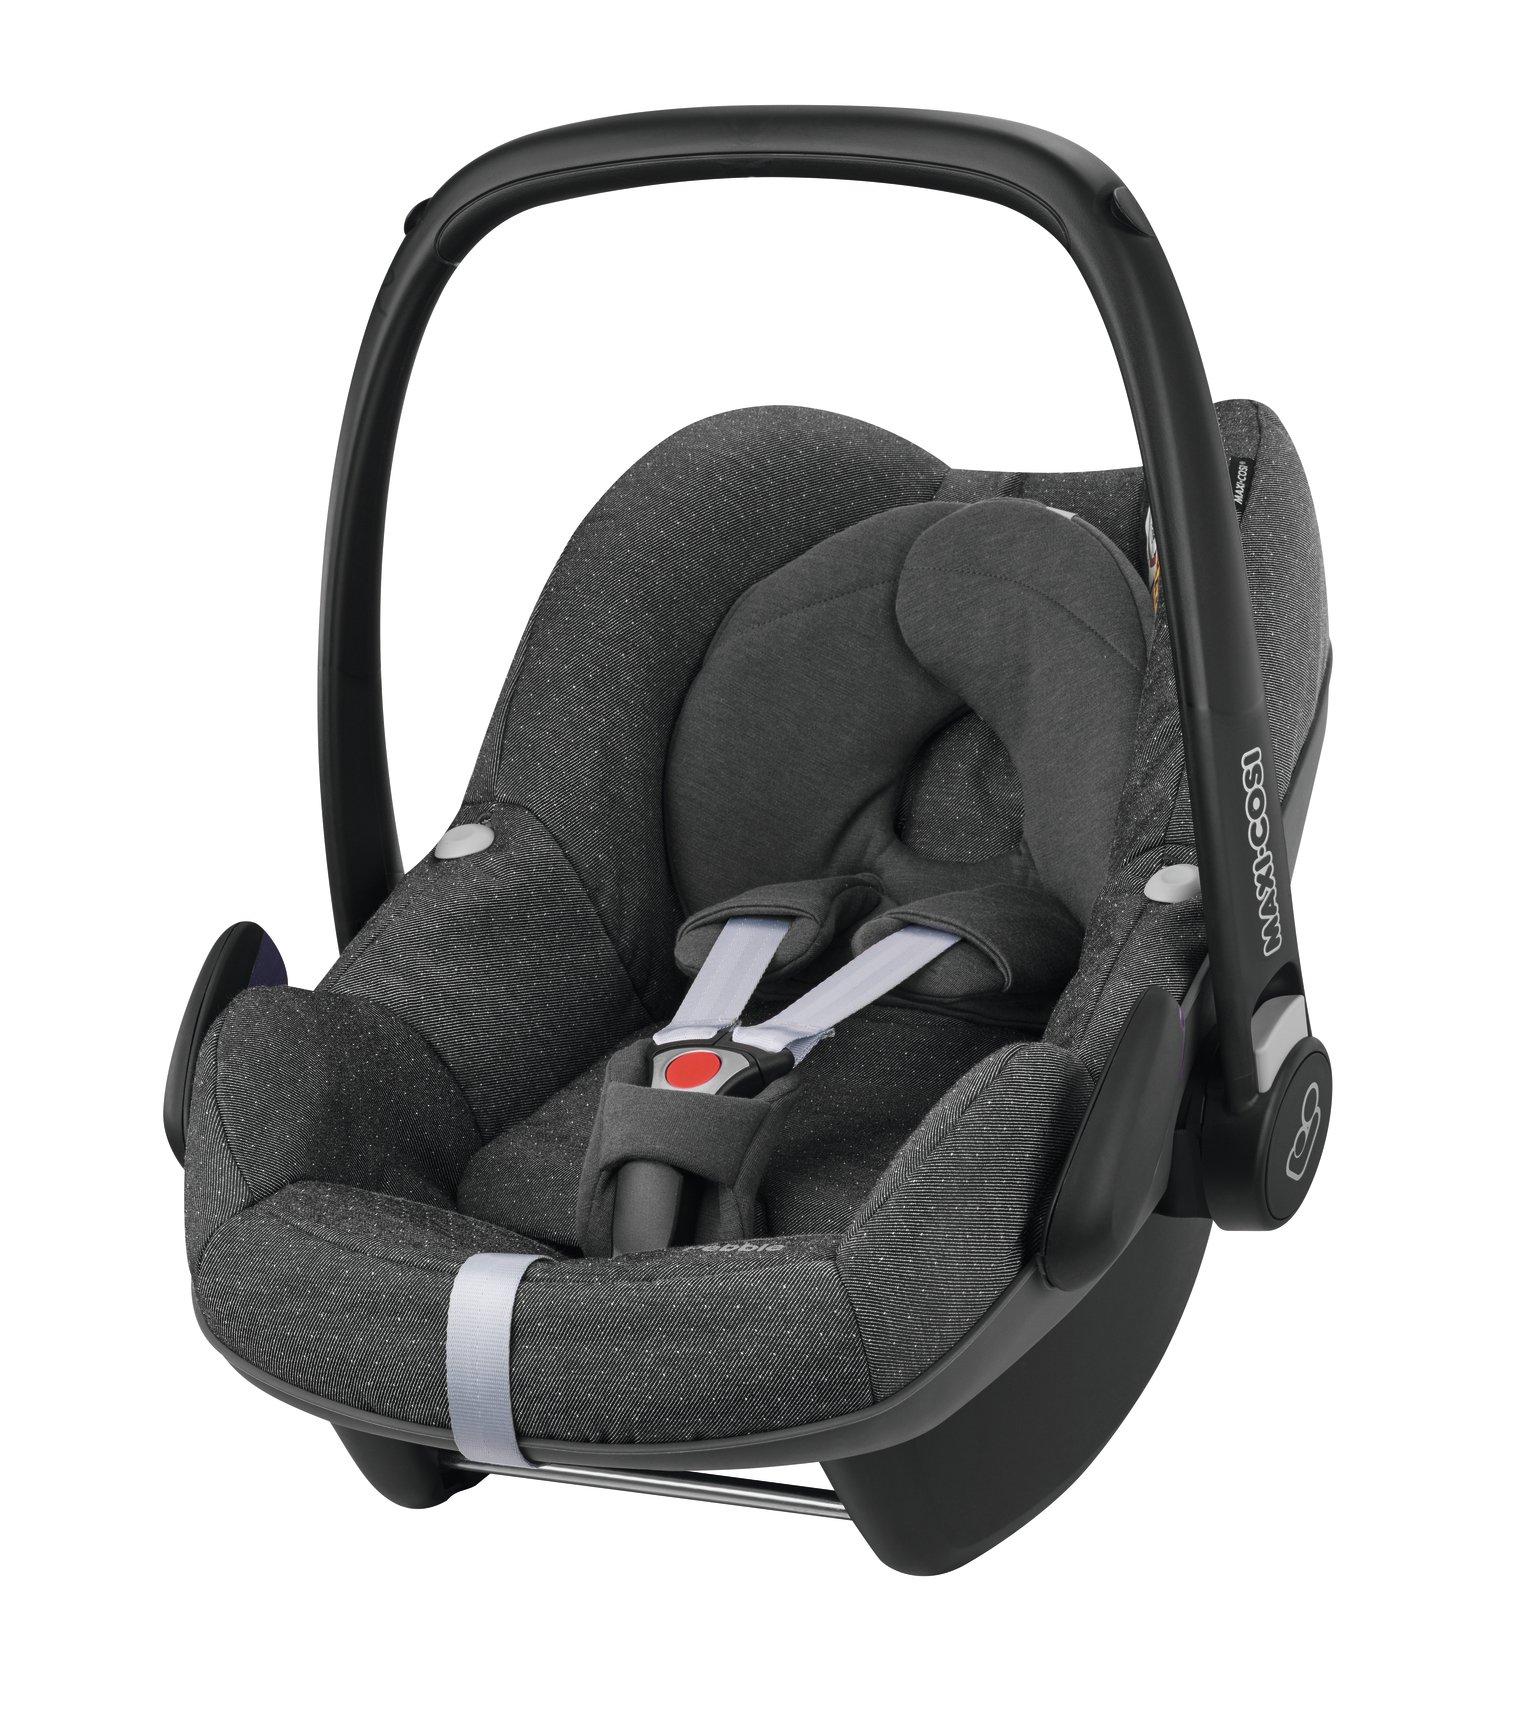 Buy Maxi-Cosi - Pebble Car Seat (0-13 kg)